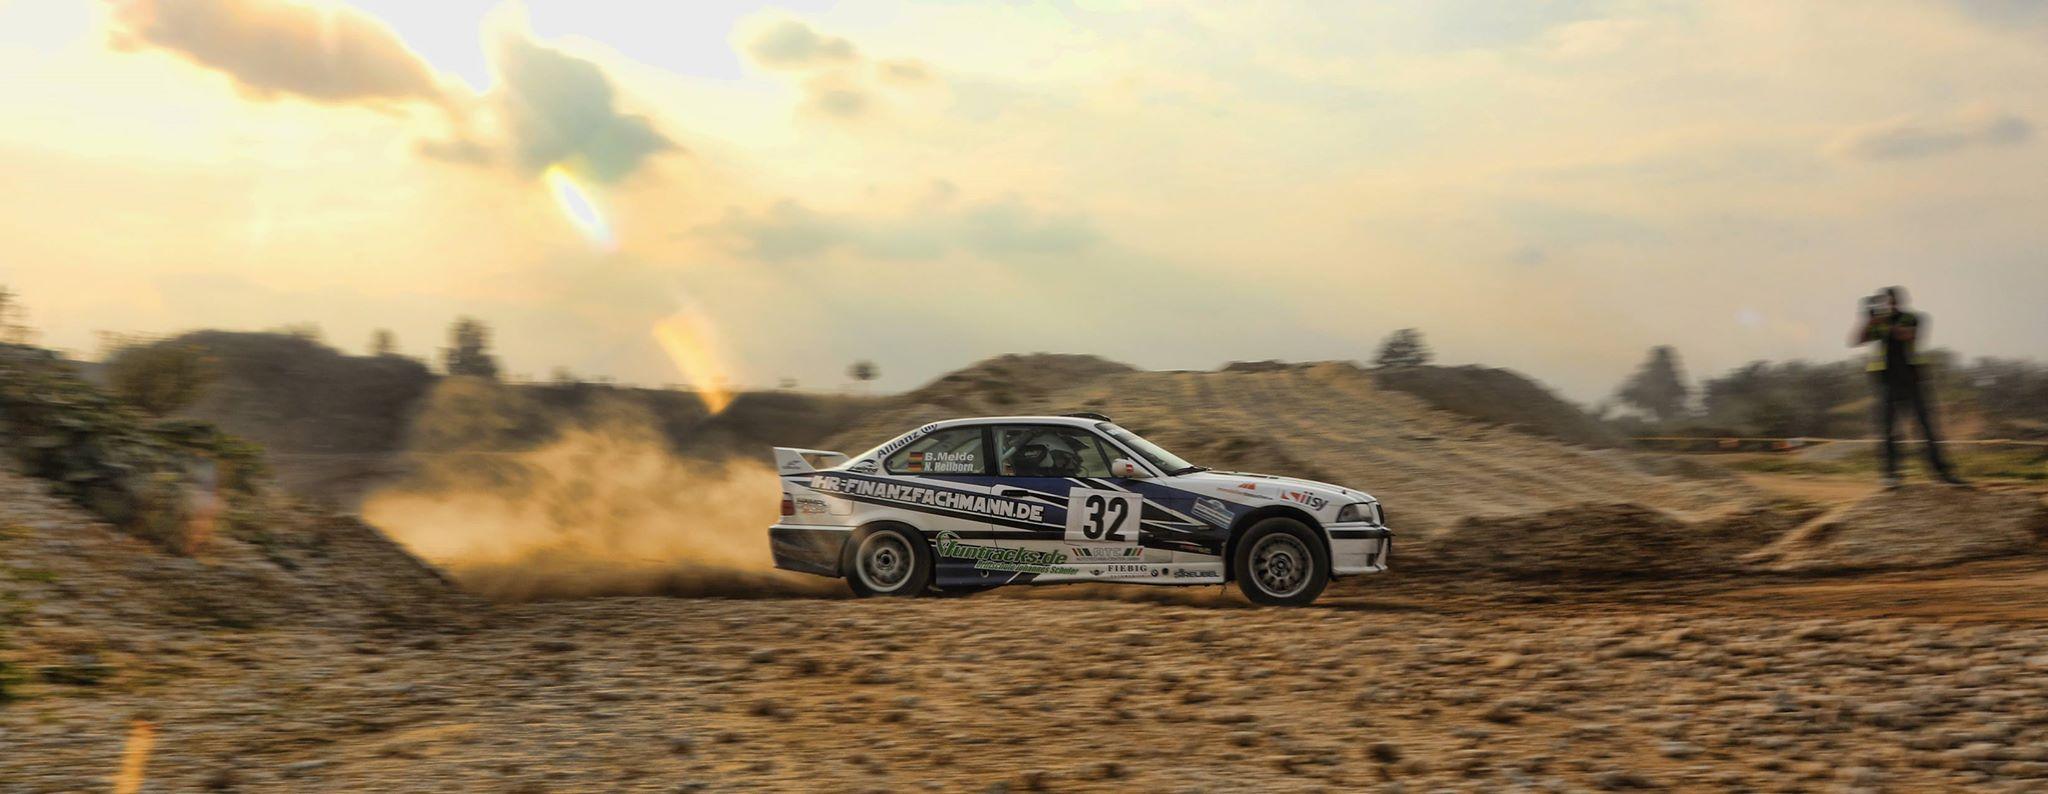 Rallye Zwickauer Land 2017 Nick Heilborn-Benjamin Melde BMW M3